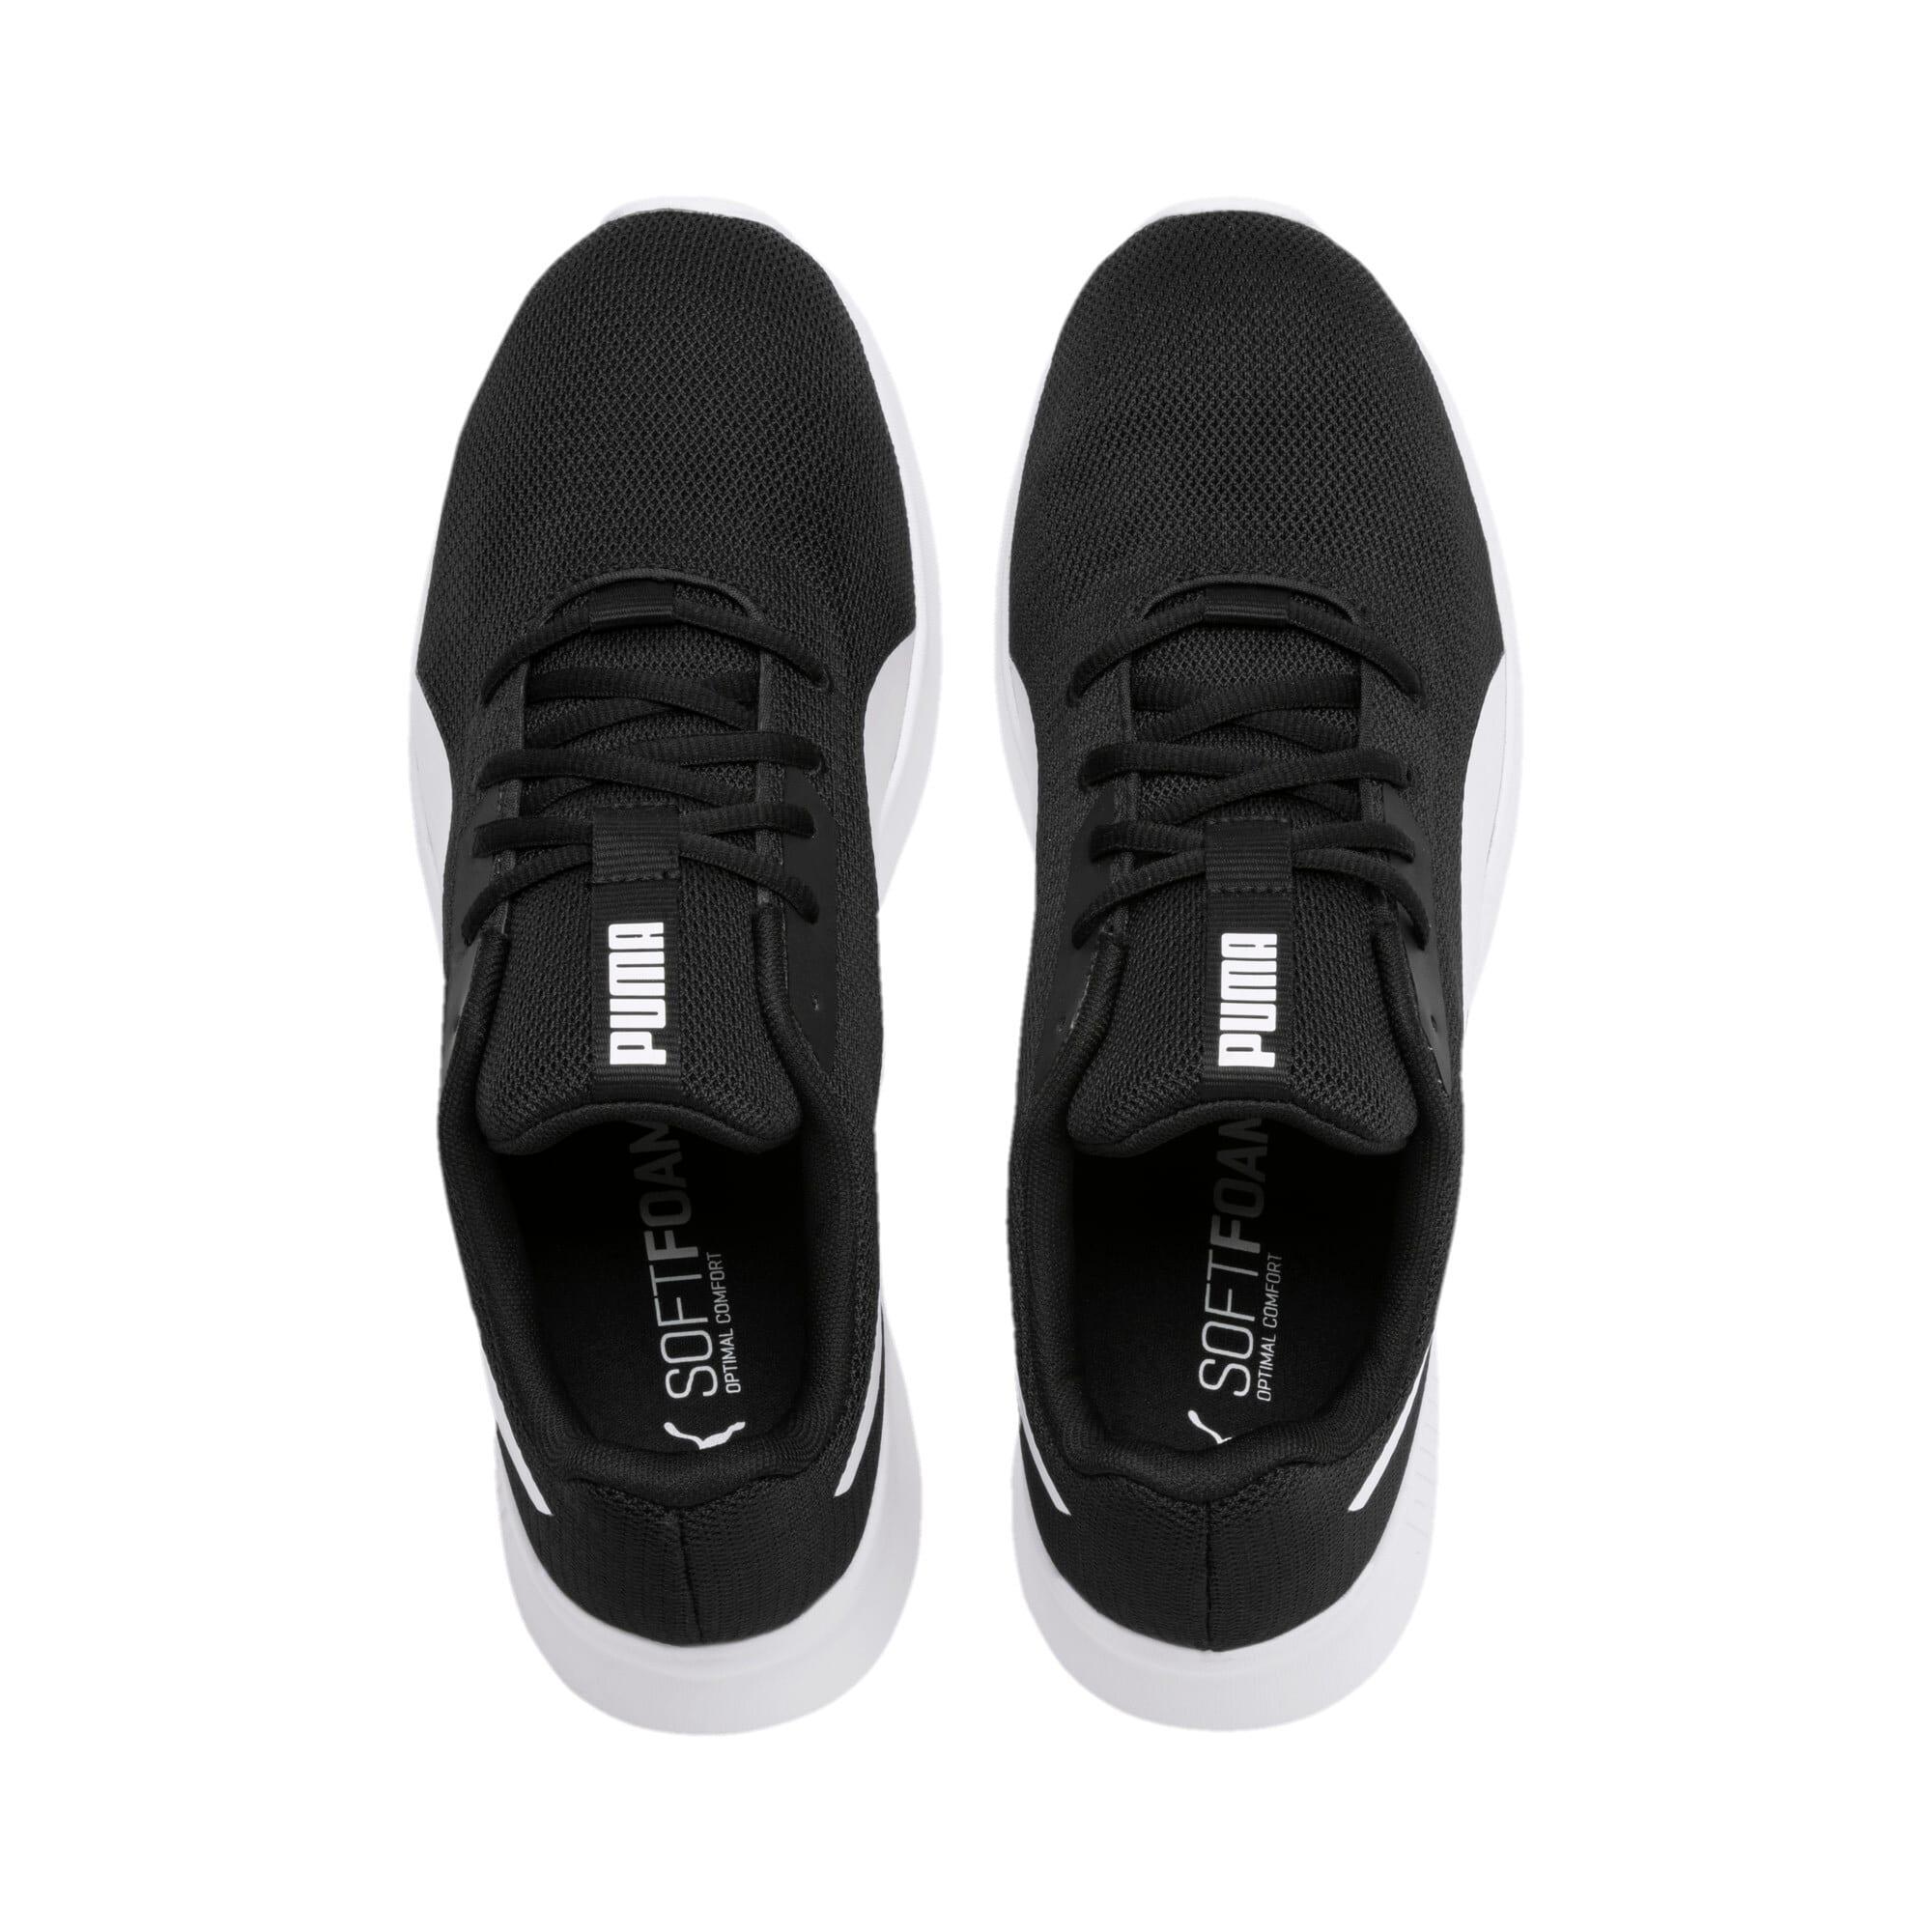 Thumbnail 8 of Modern Runner Sneakers, Puma Black-Puma White, medium-IND